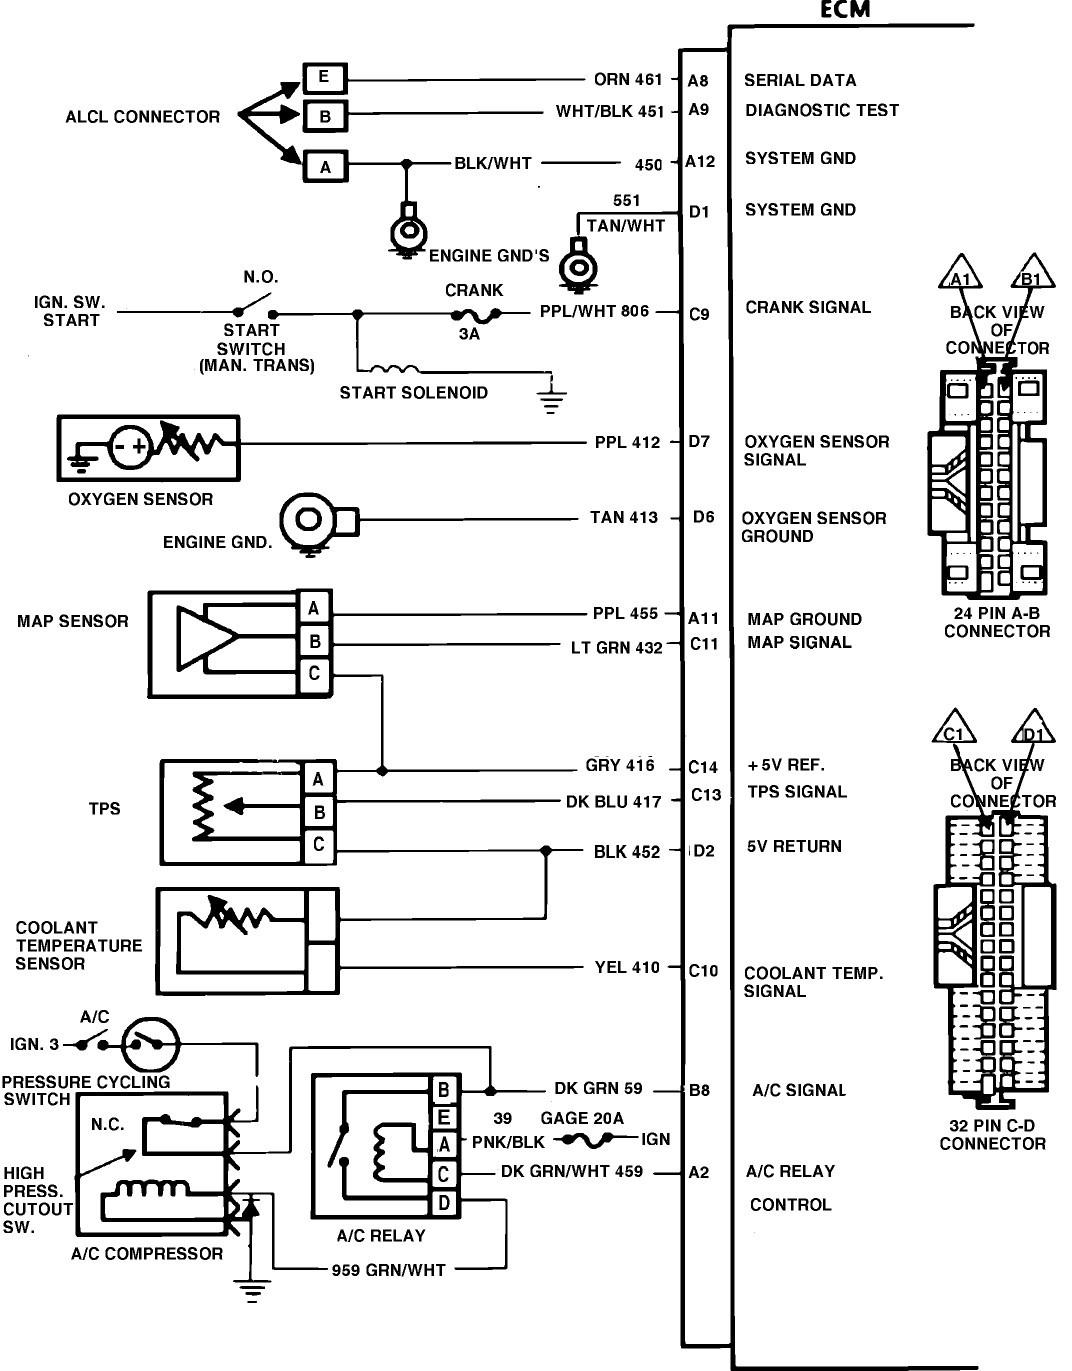 Xr 3440 2000 Chevrolet Cavalier Wiring Diagram Wiring Diagram